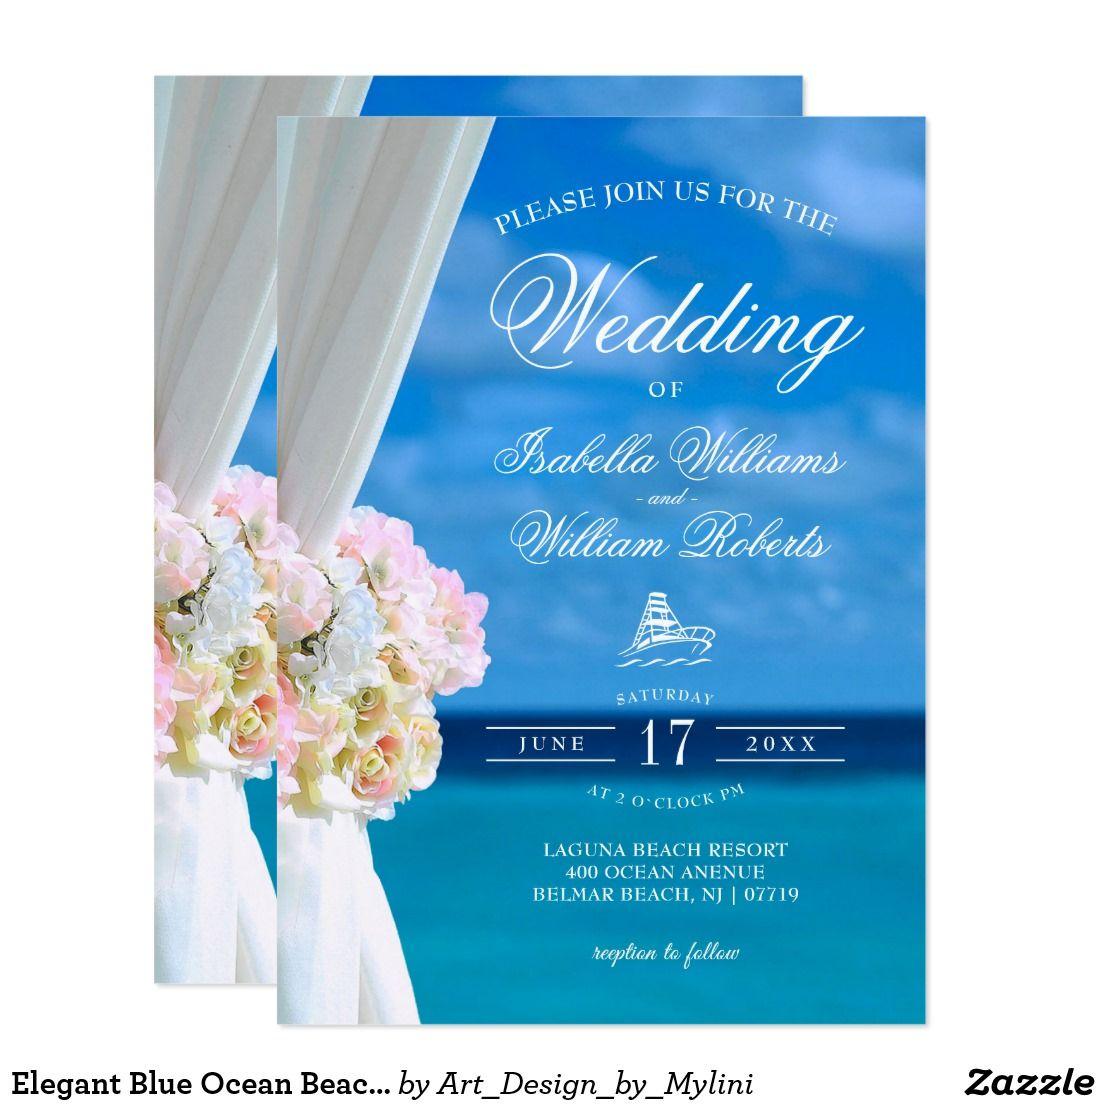 Elegant Blue Ocean Beach Wedding Invitation Wedding Invitations